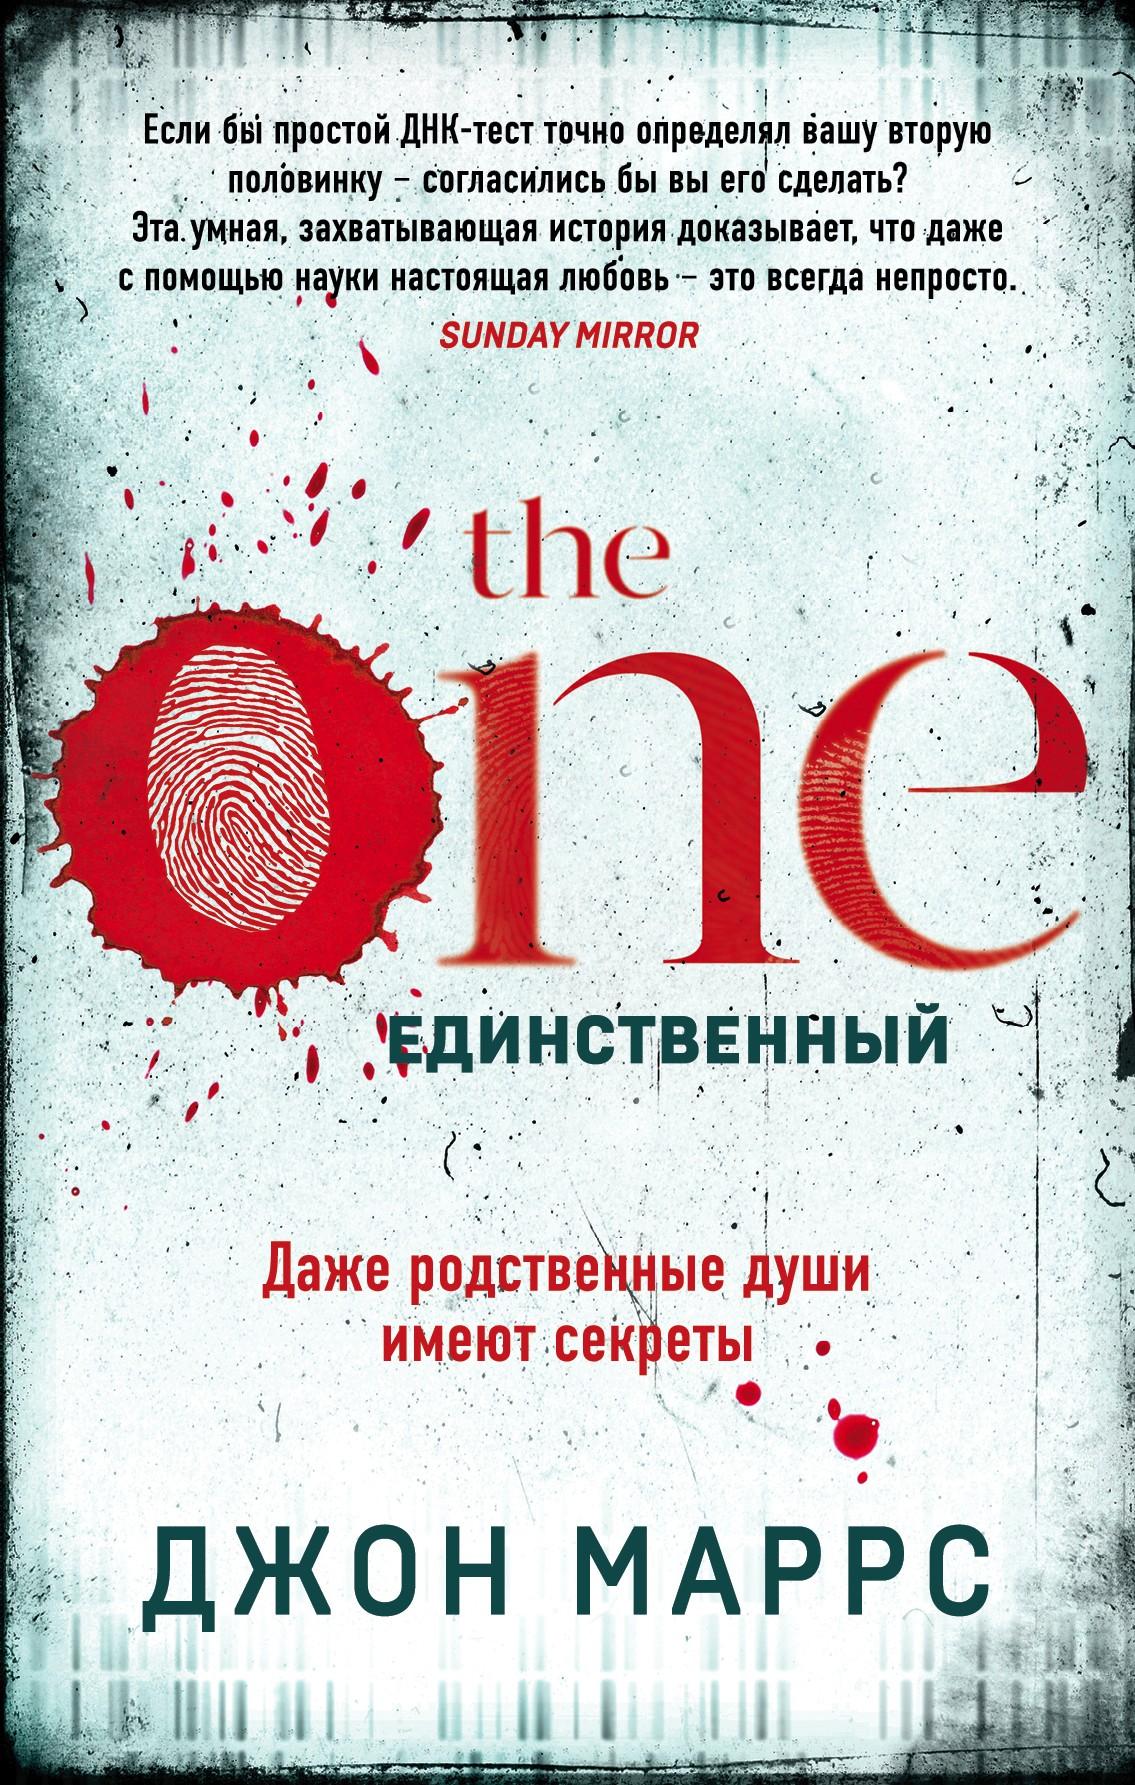 Джон Маррс - The One. Единственный